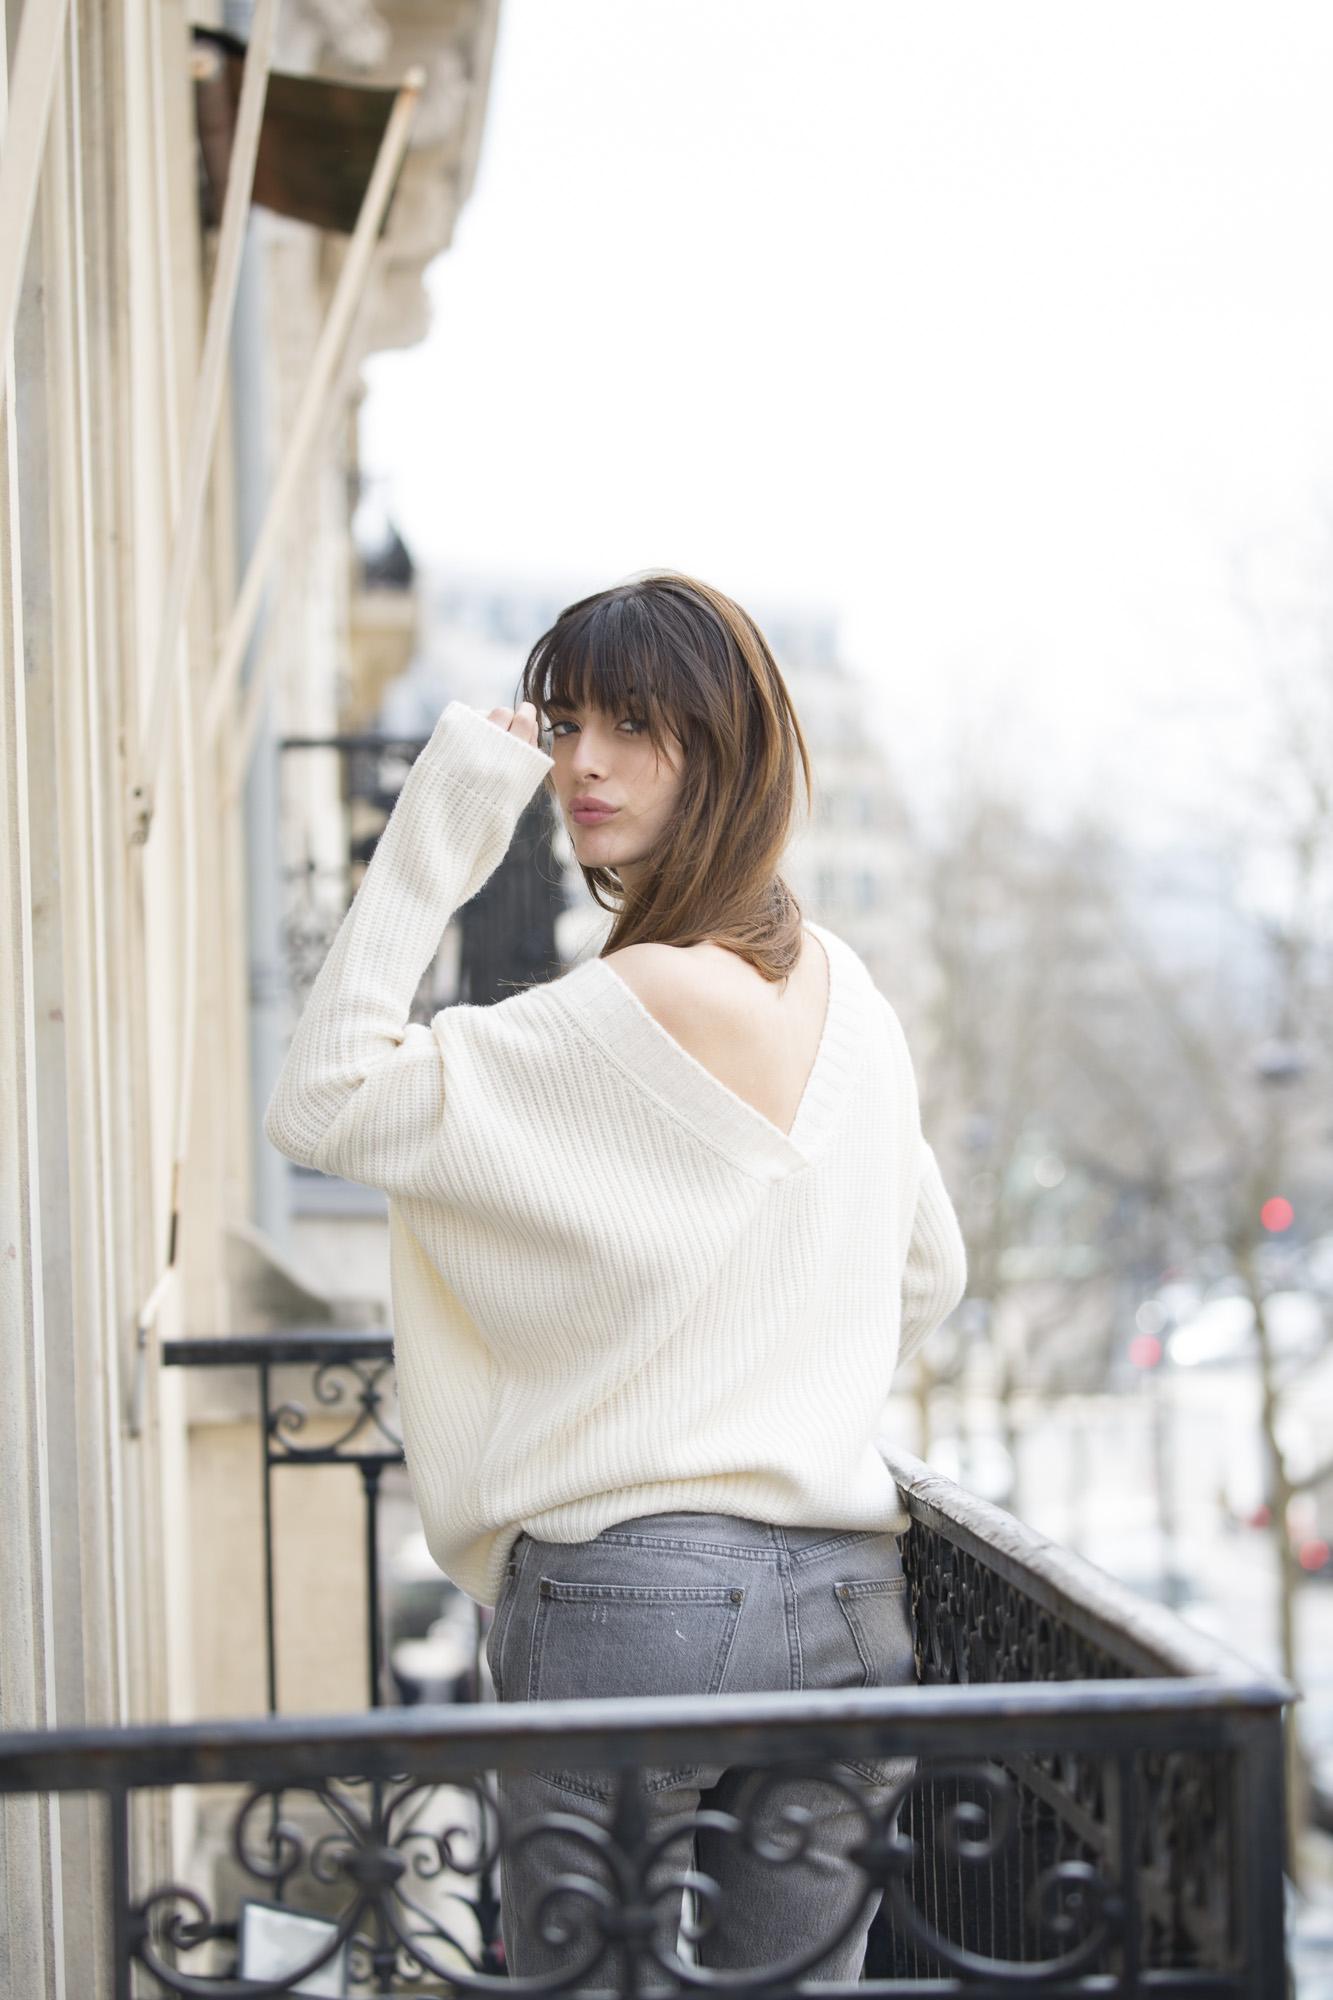 lookbook-kujten-folkr-winter-2016-blog-mode-lifestyle-5